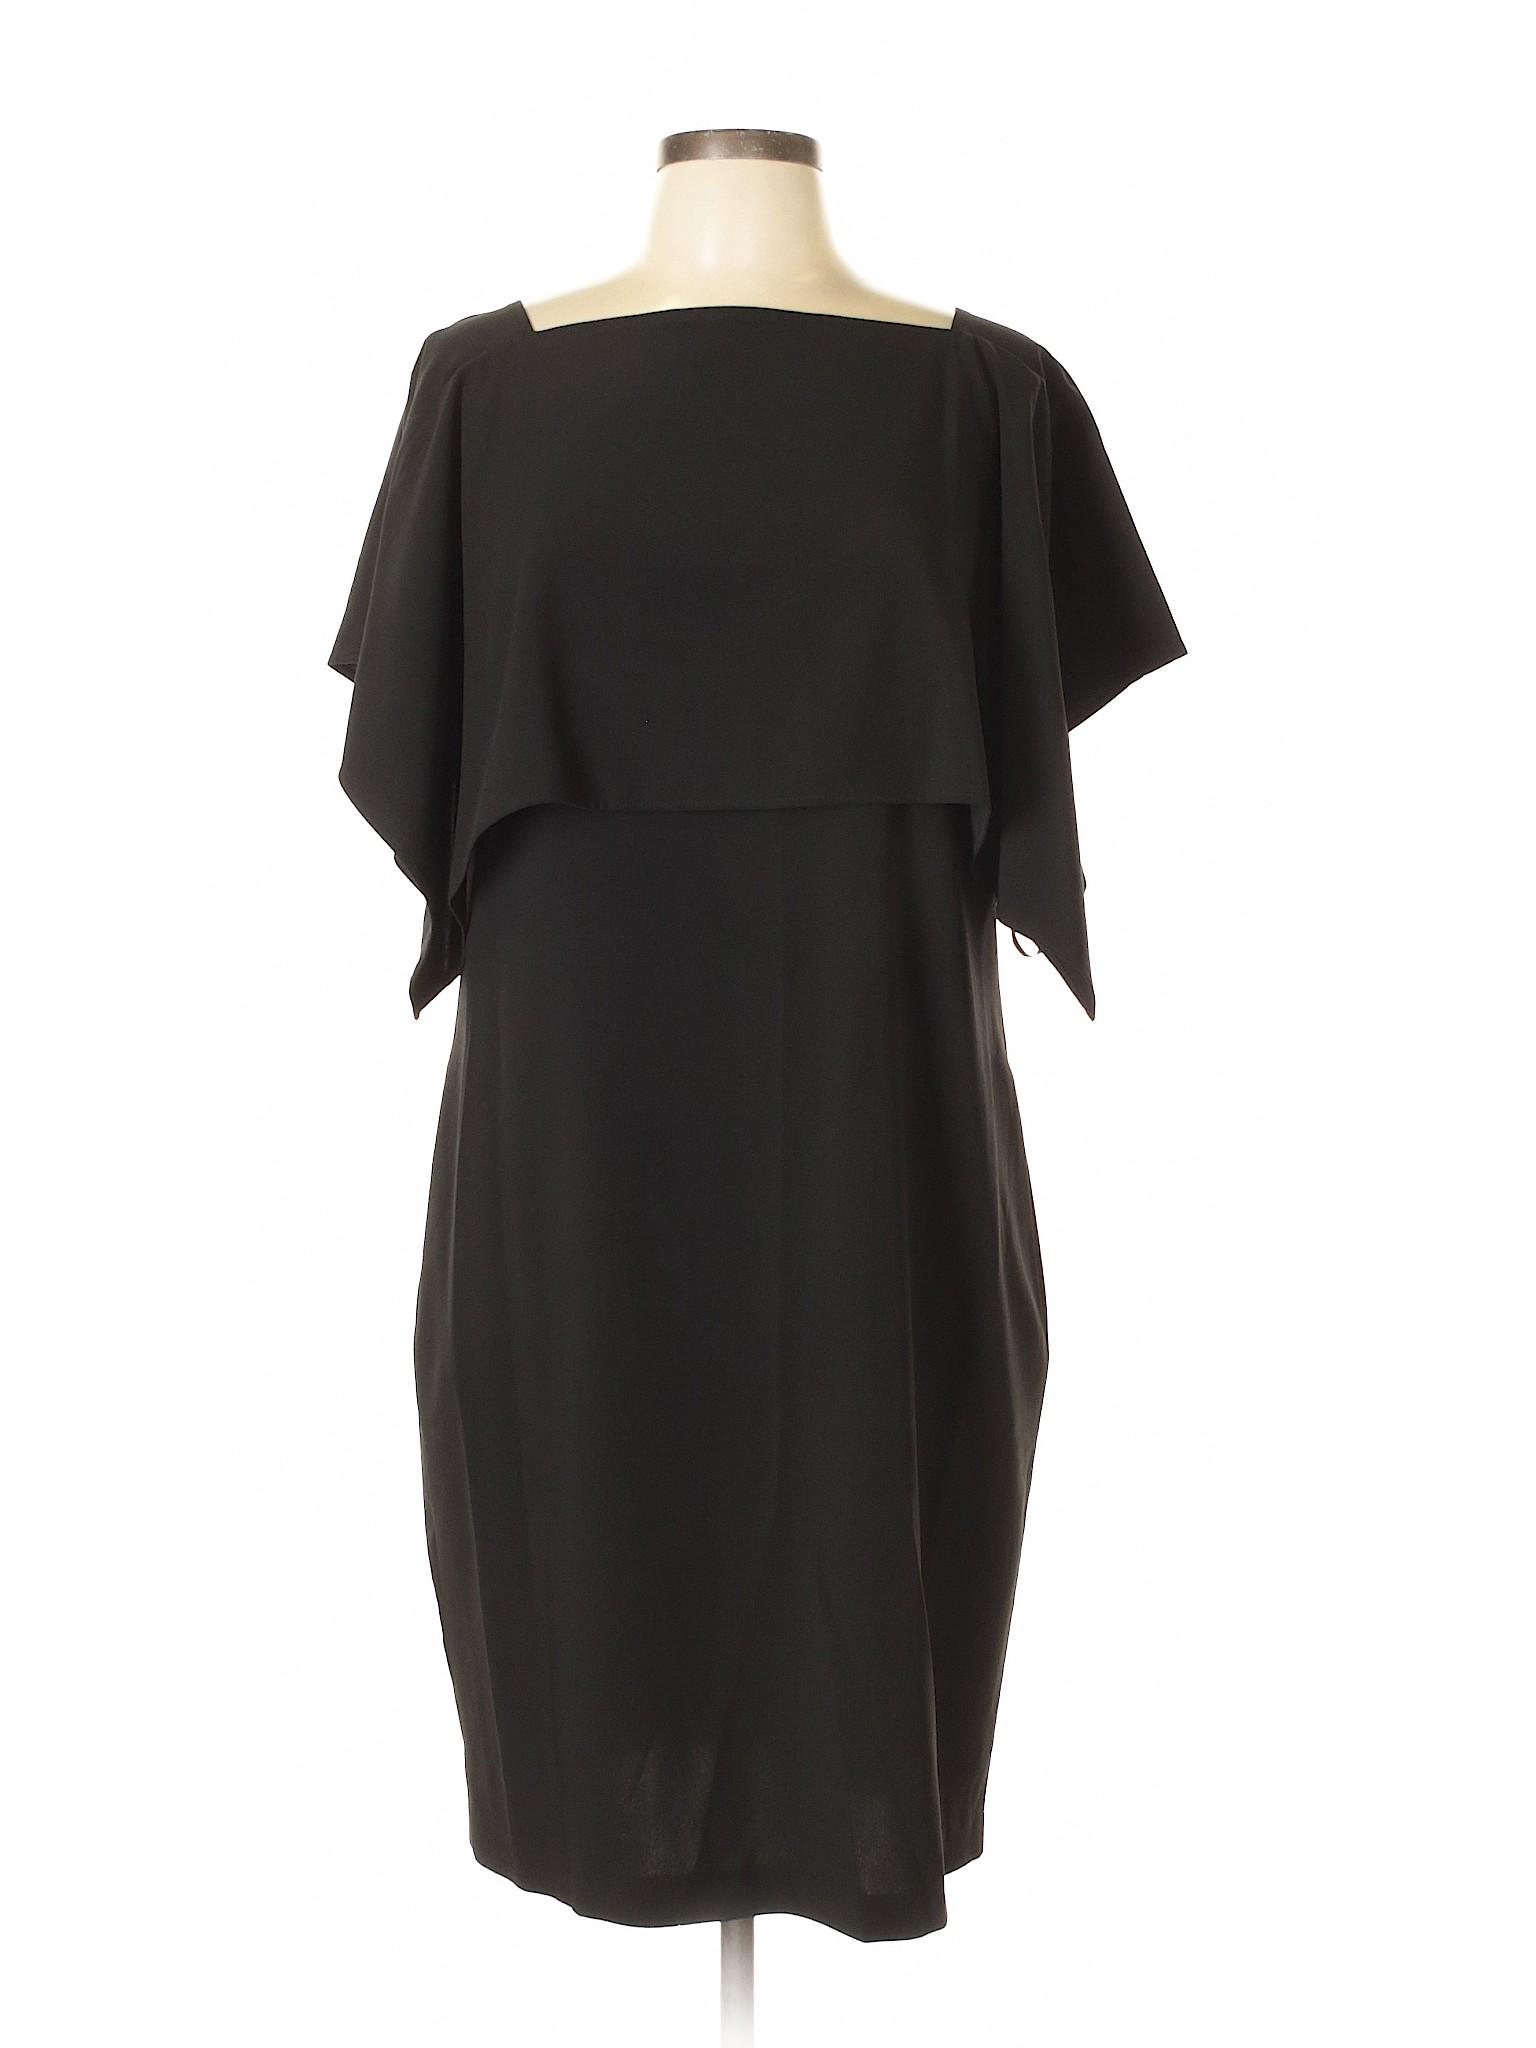 Calvin Klein Solid Black Cocktail Dress Size 12 - 72% off | thredUP